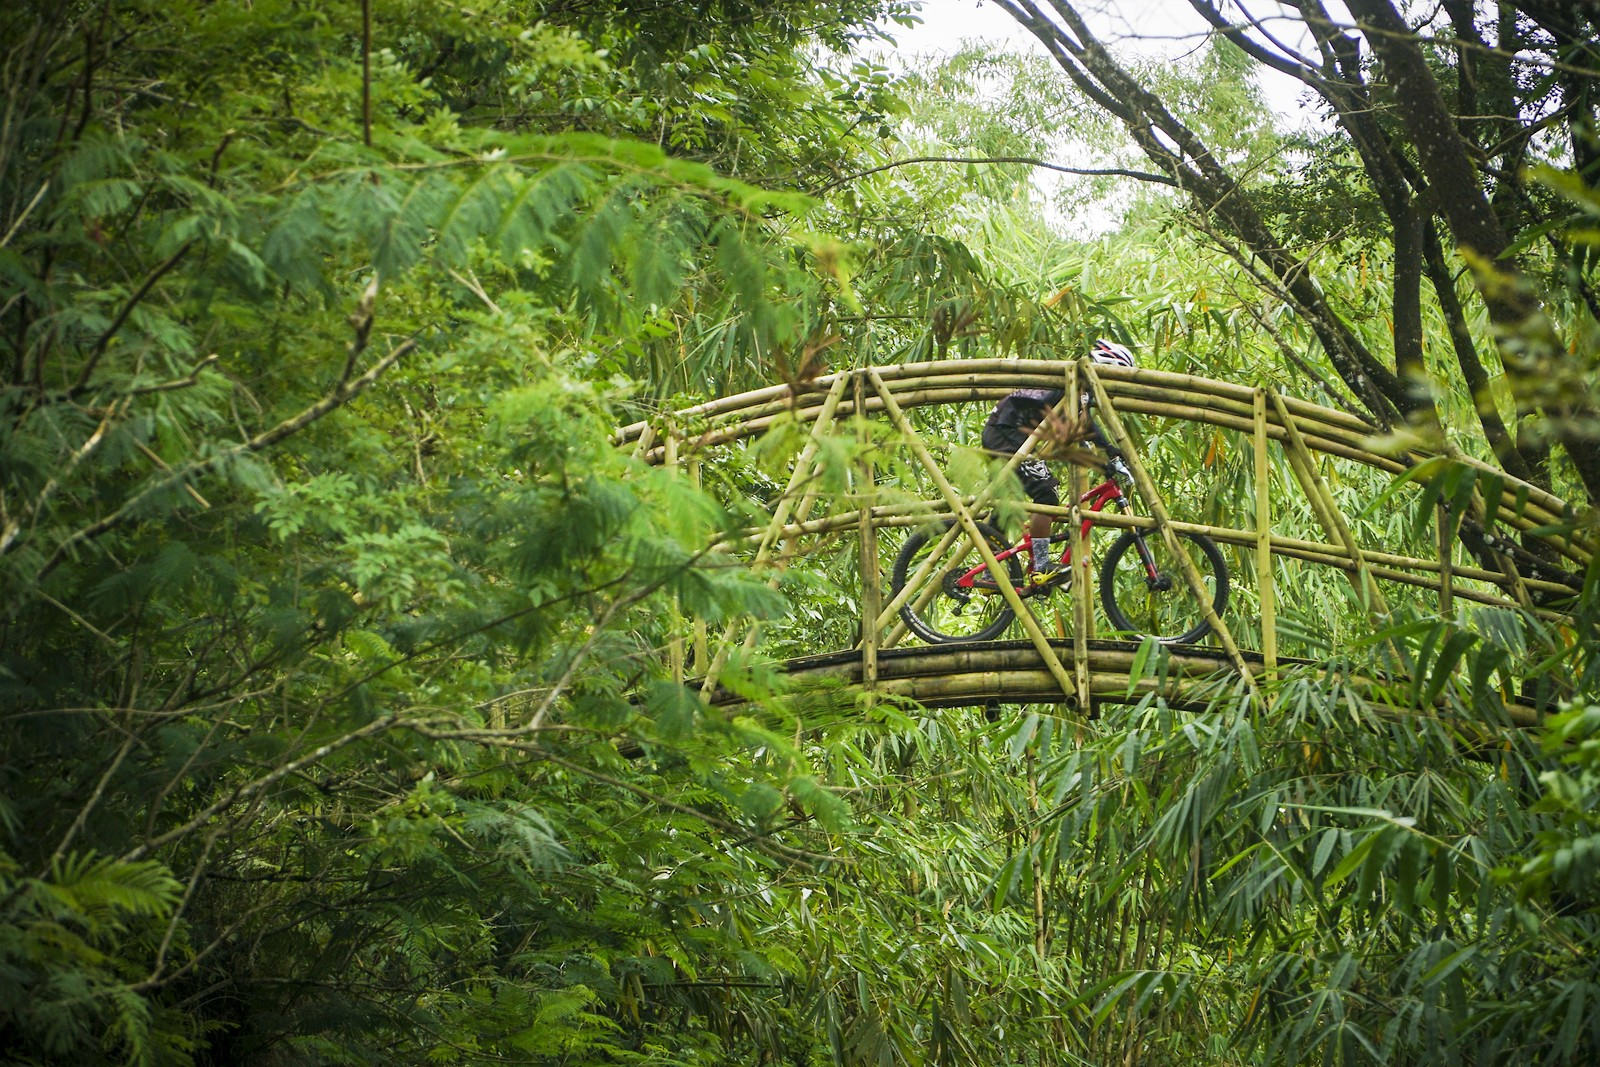 Man made bridge and natural trail - RezaAkhmad - Mountain Biking Pictures - Vital MTB